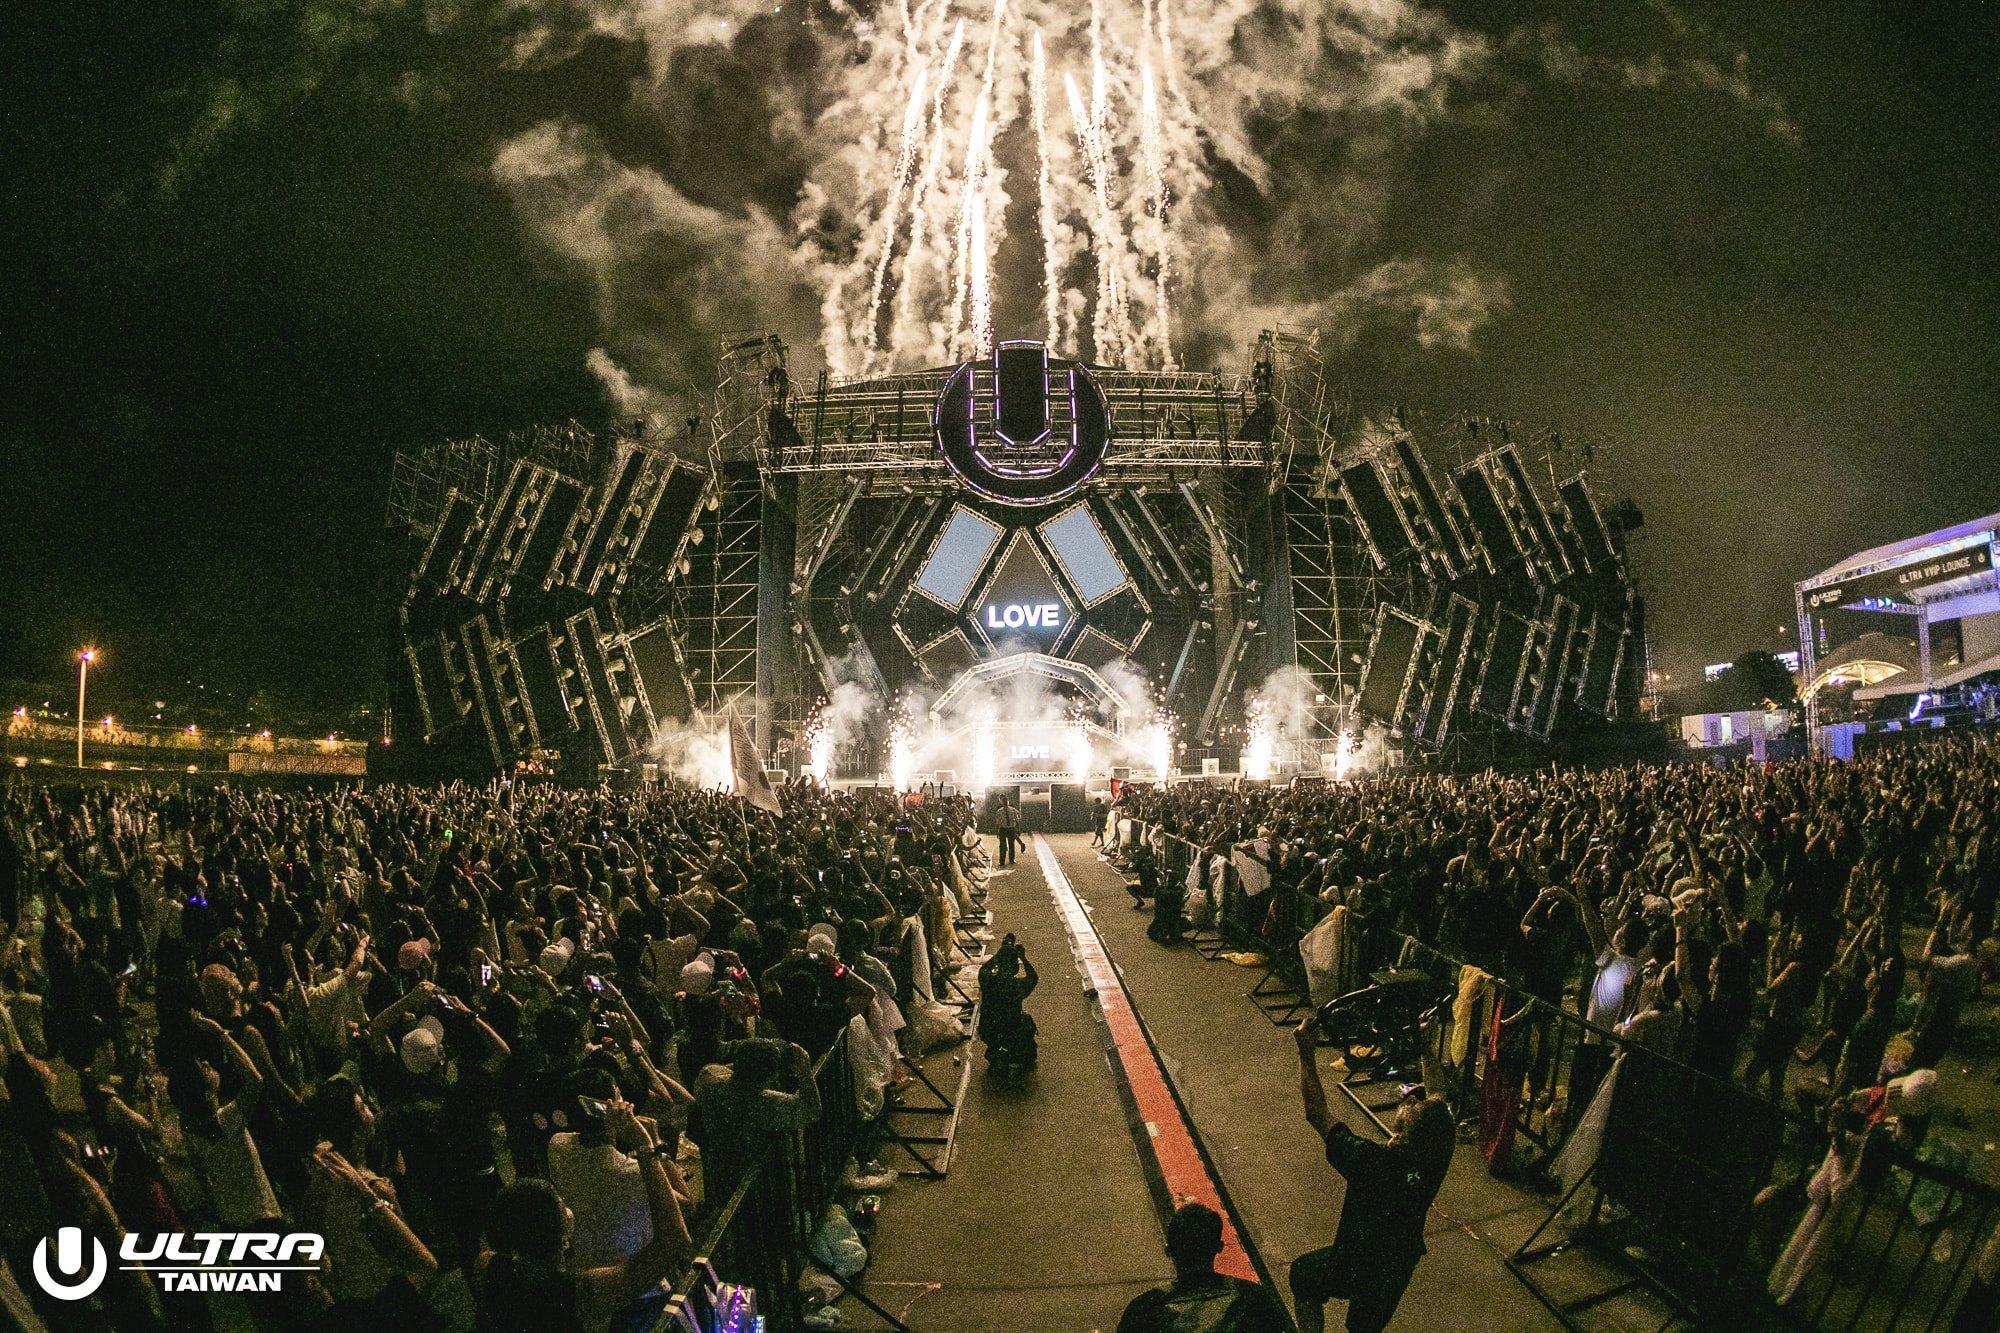 Road to Ultra Taiwan 2020 超世代音樂節!全球第一電音節11/14強勢回歸 - threeonelee.com